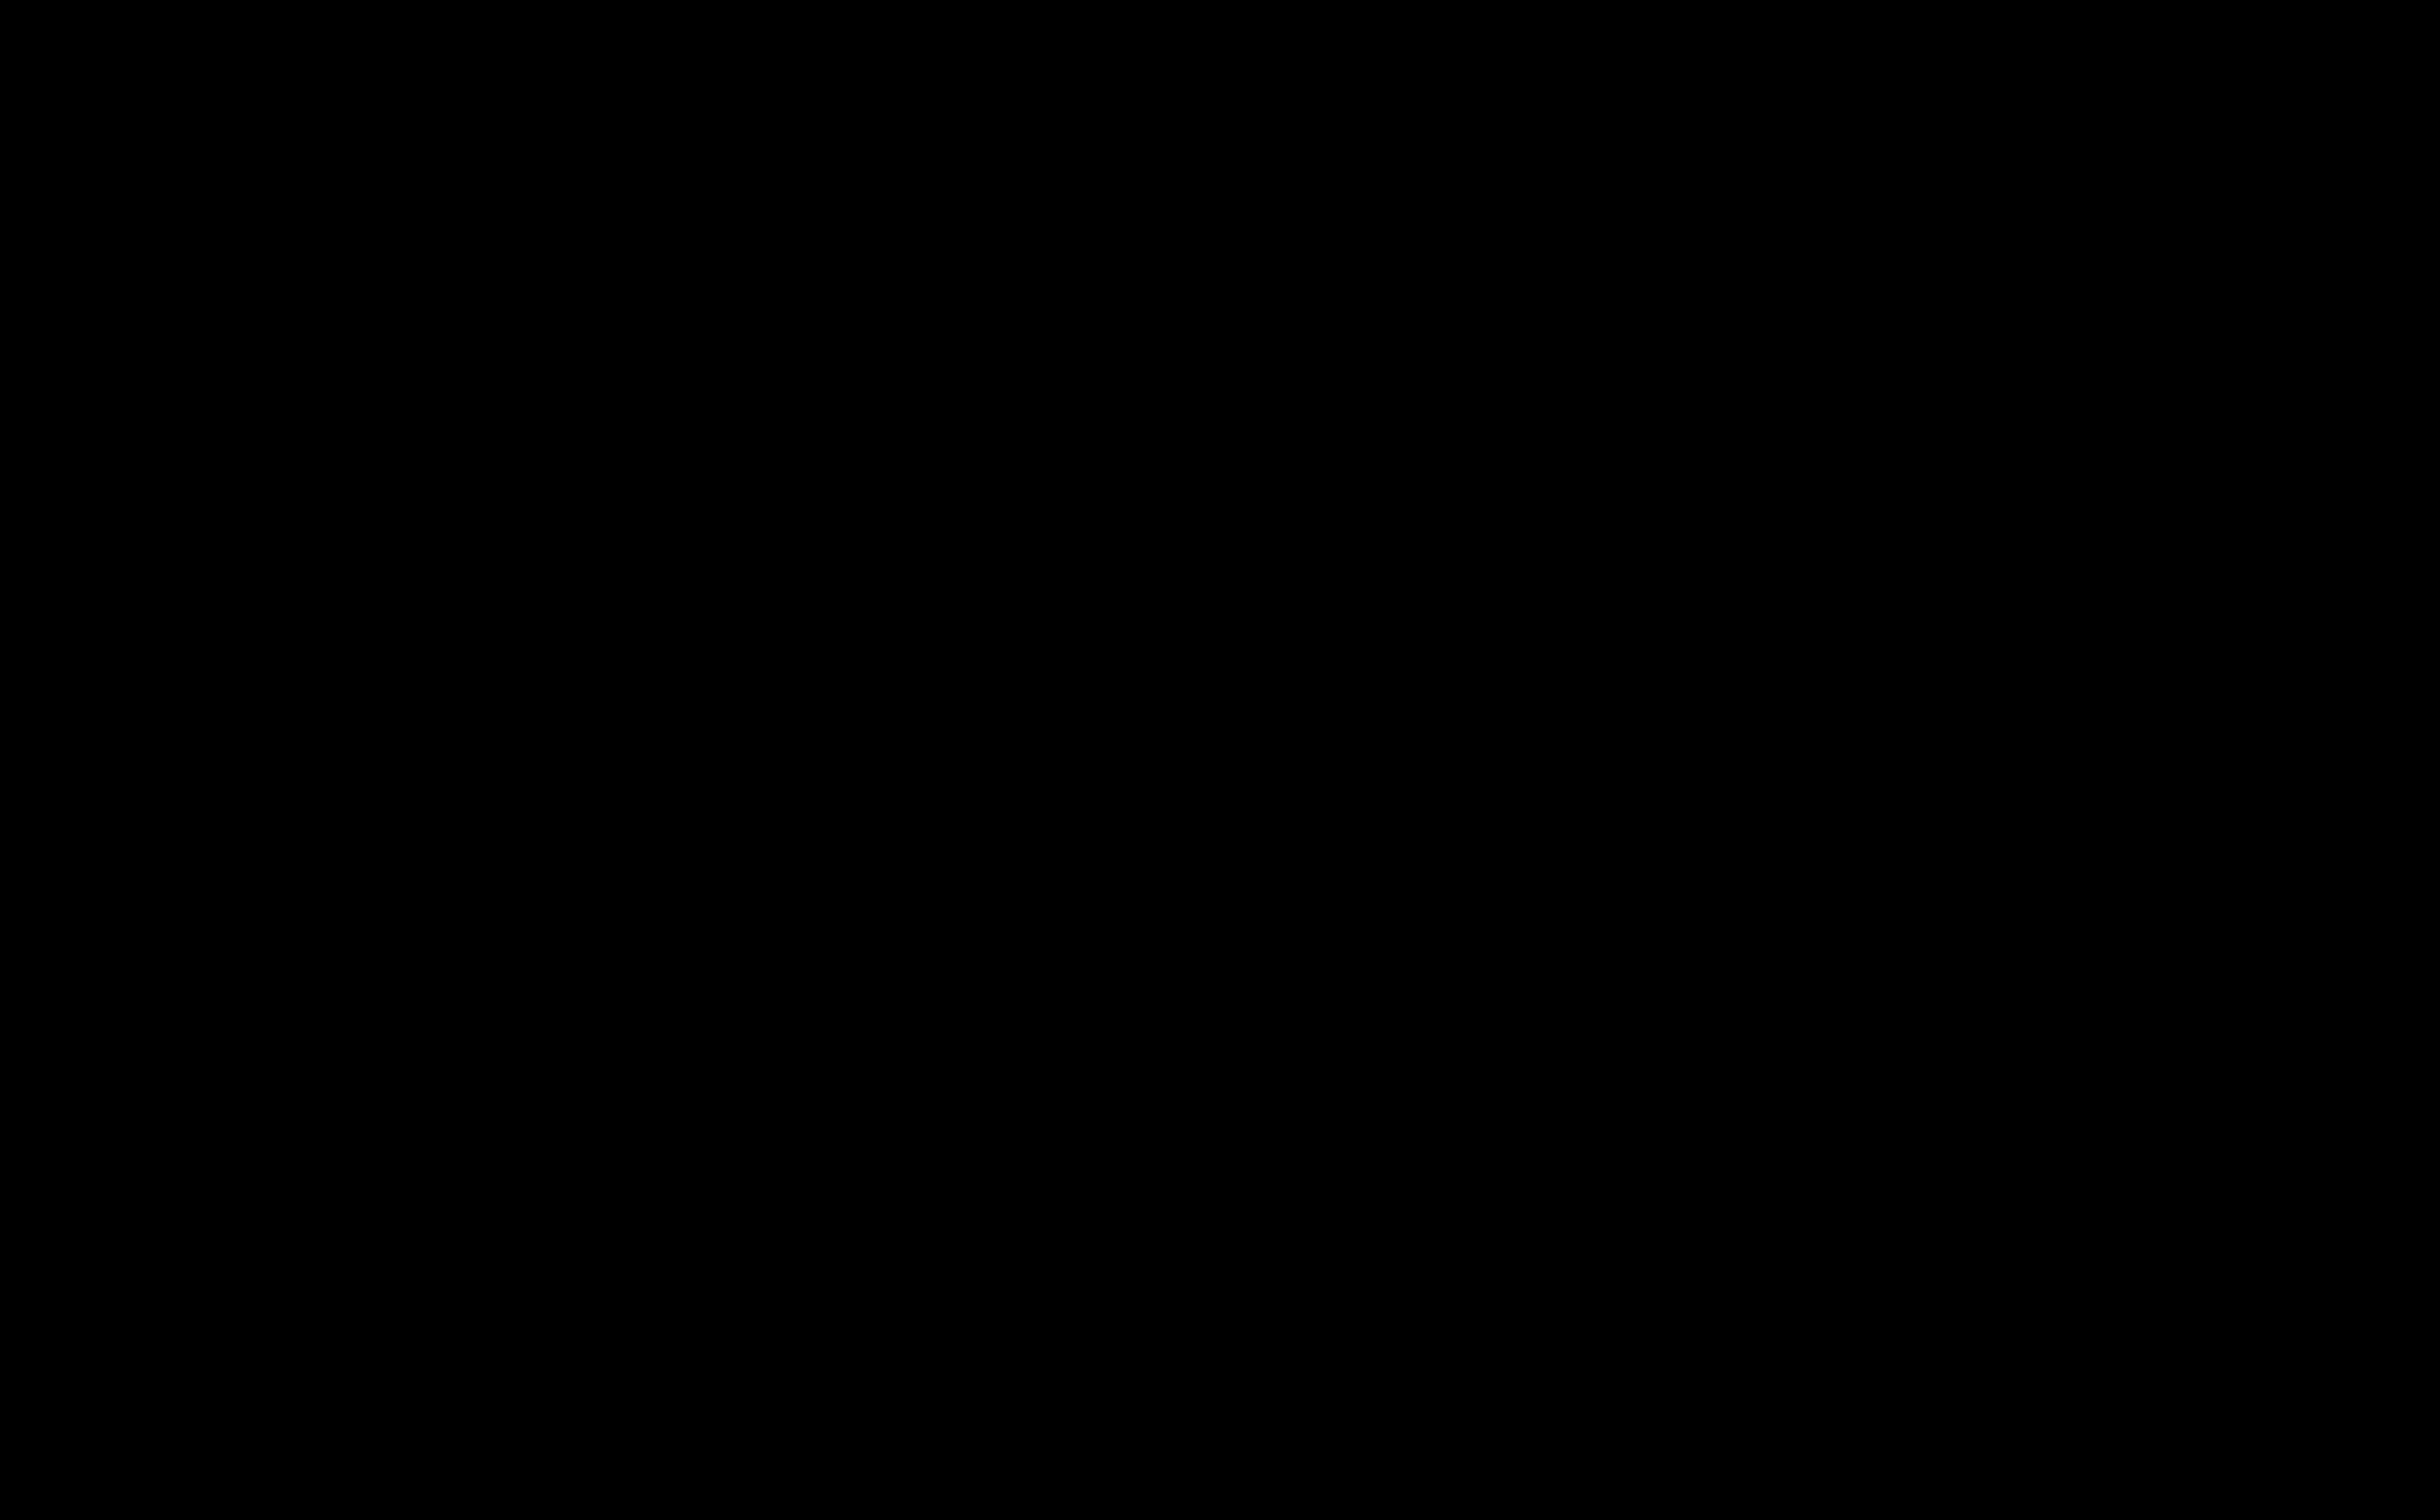 GÖTTI // CHARACTER MEETS TRANSPARENCY